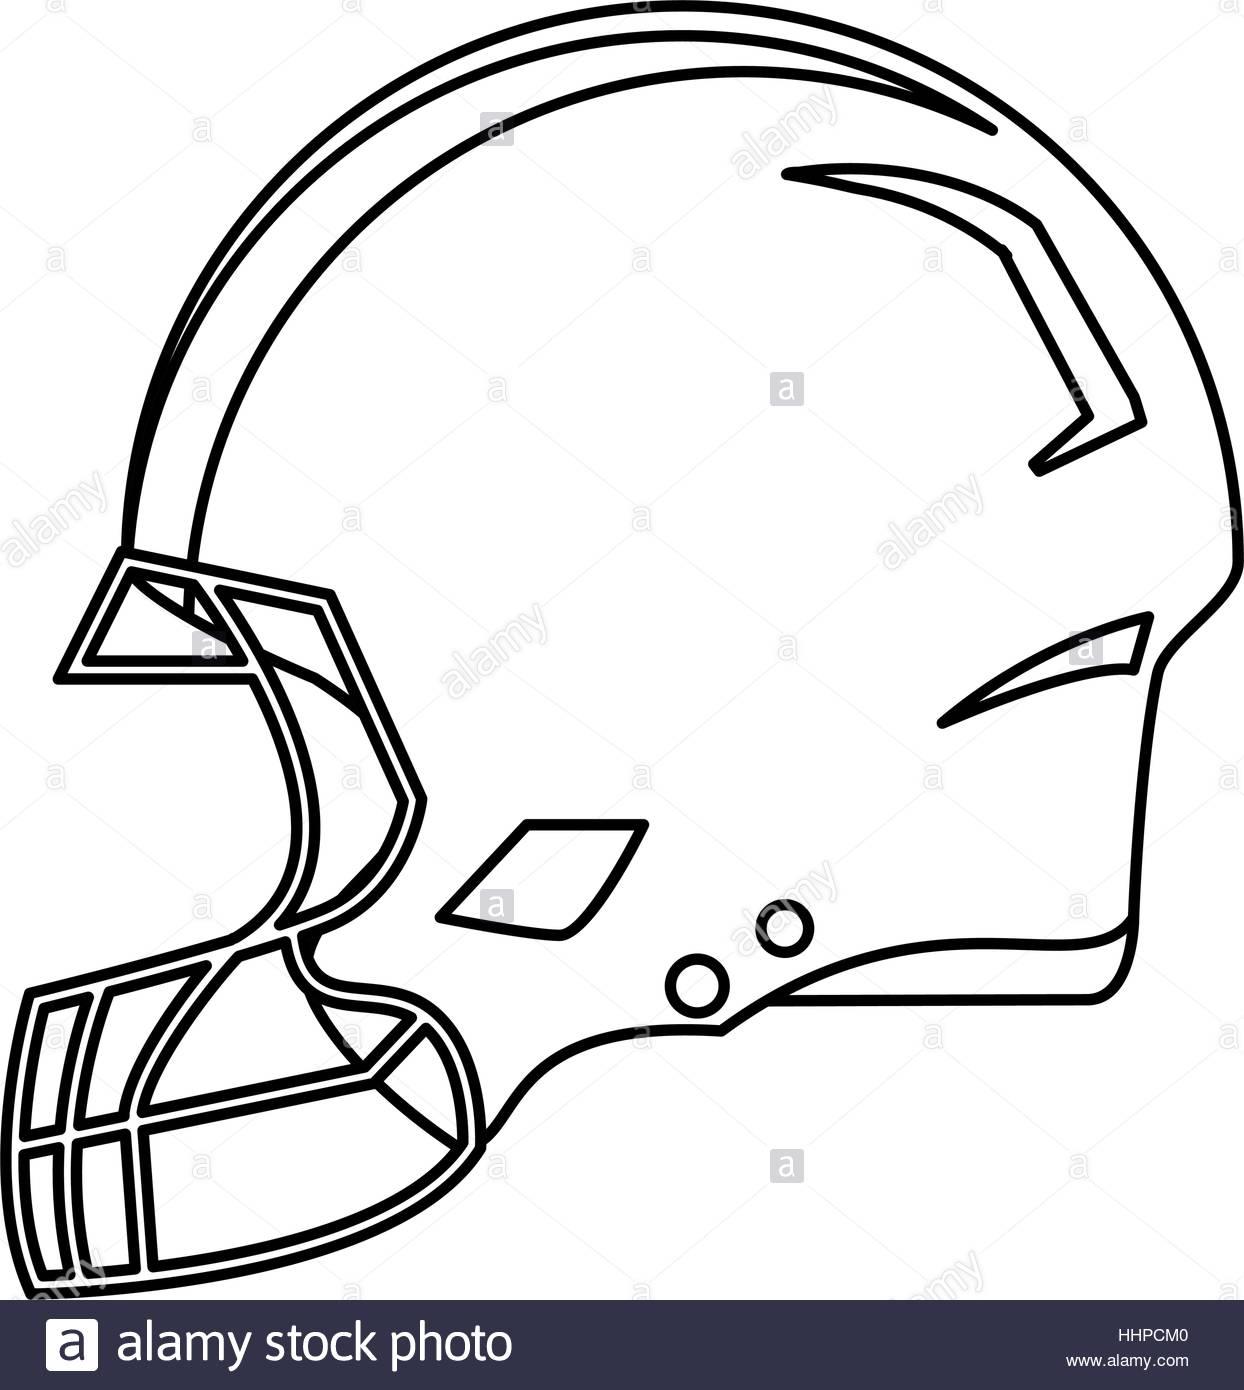 1244x1390 American Football Helmet Protection Outline Hhpcm0